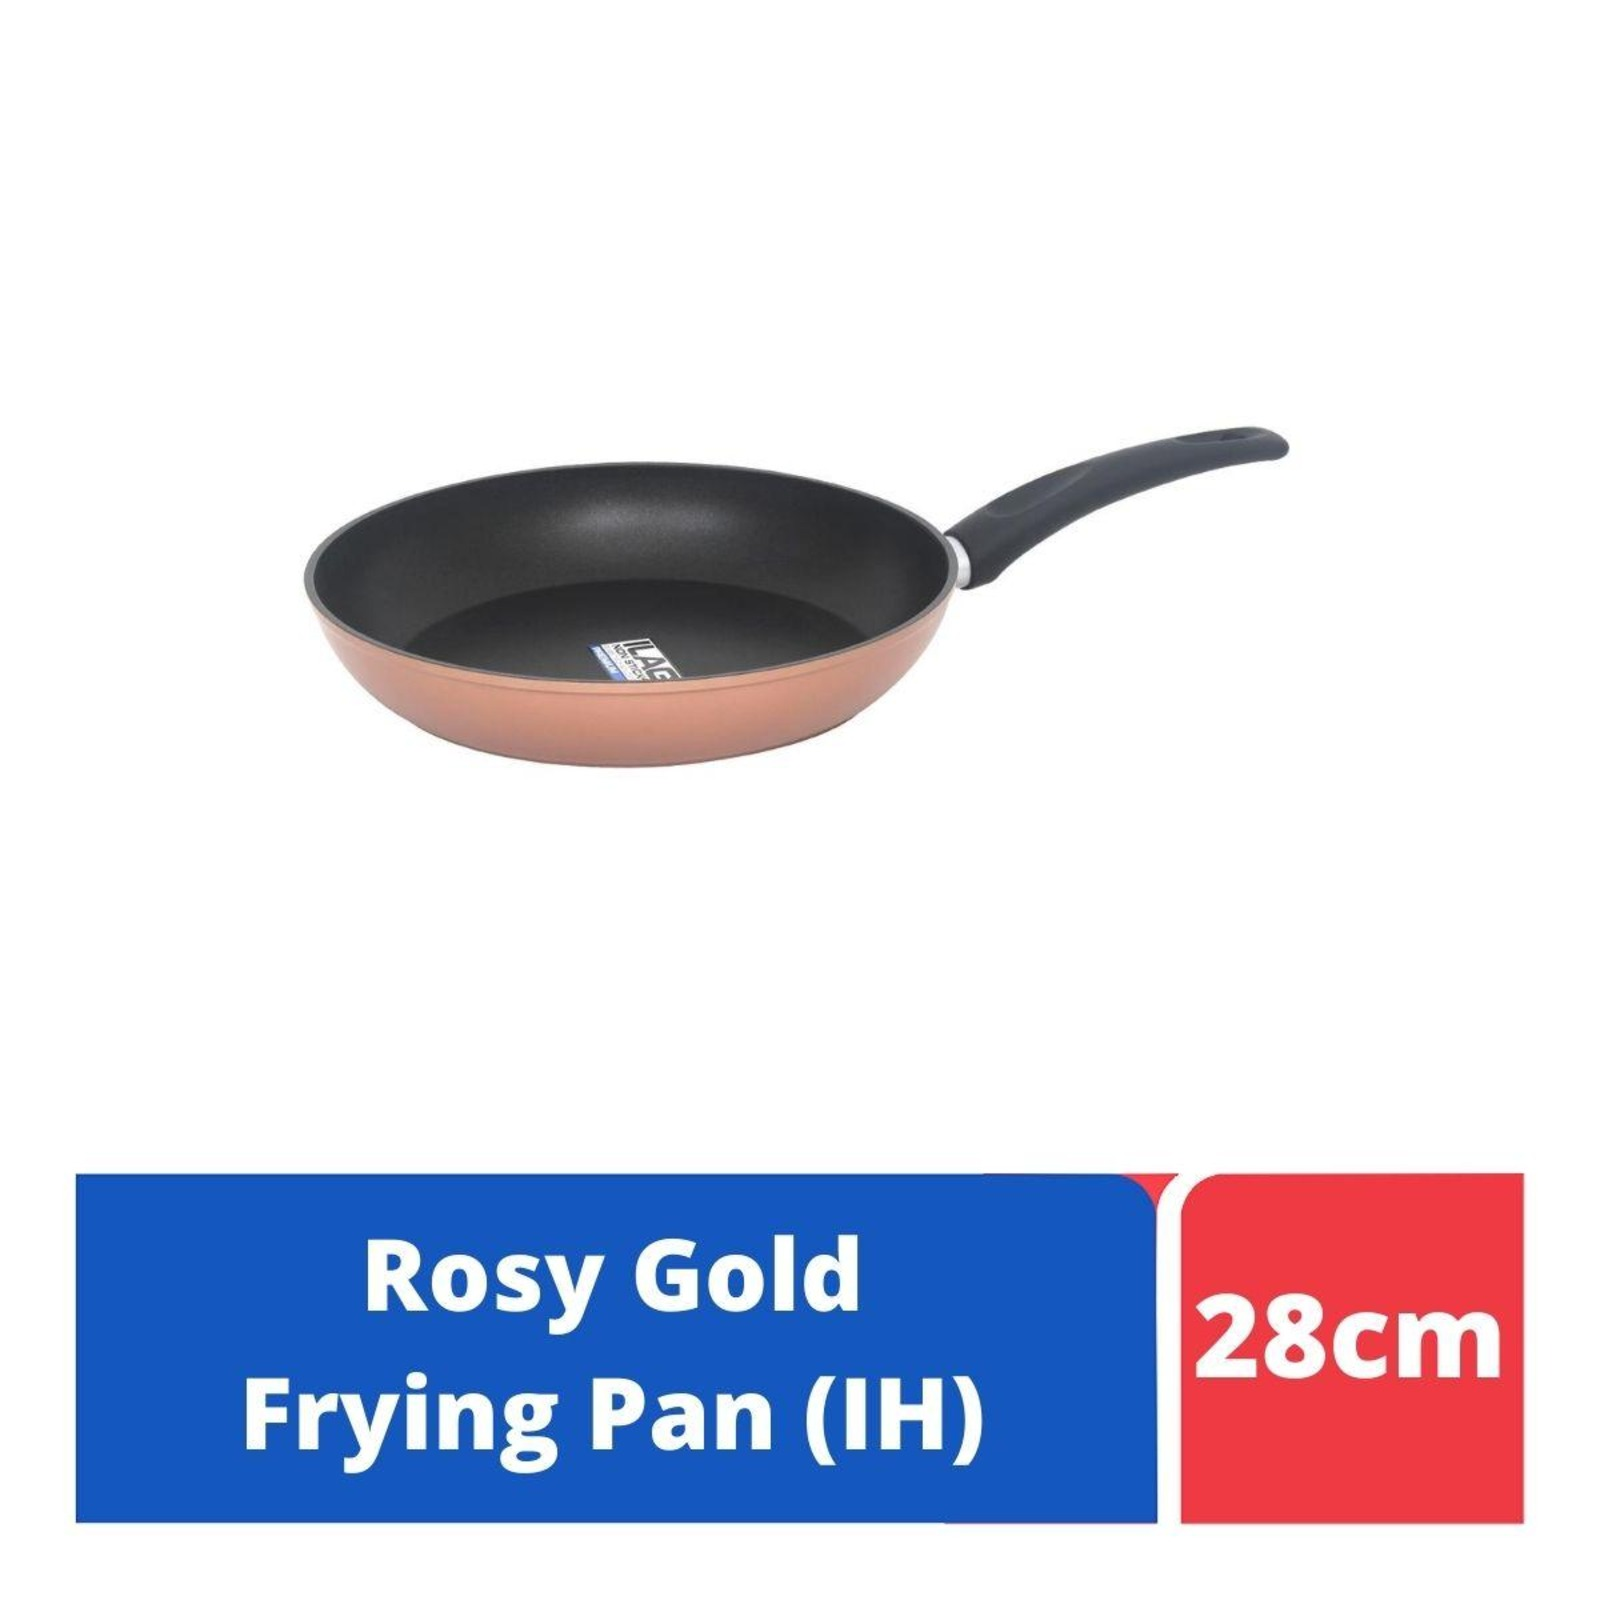 LOCK&LOCK Rosy Gold IH Frying Pan 28cm